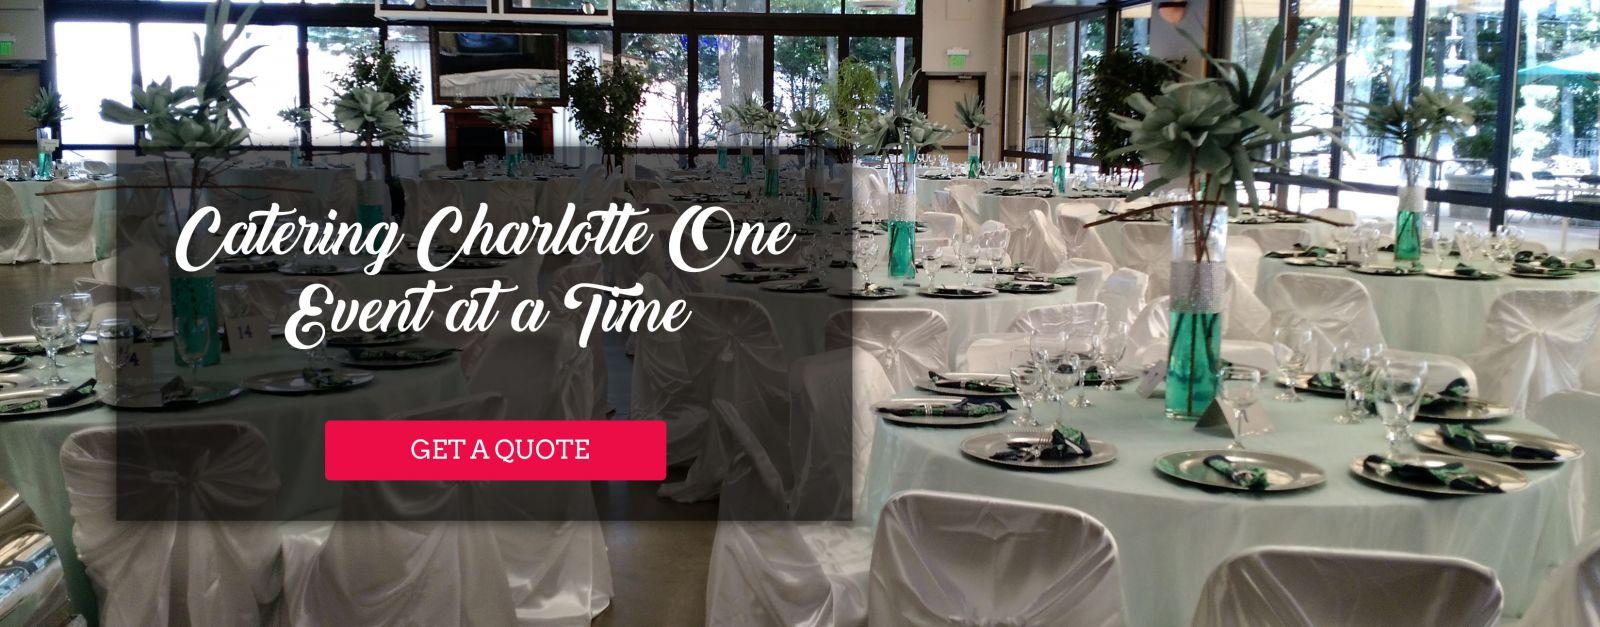 SMS Catering-WeddingSlider